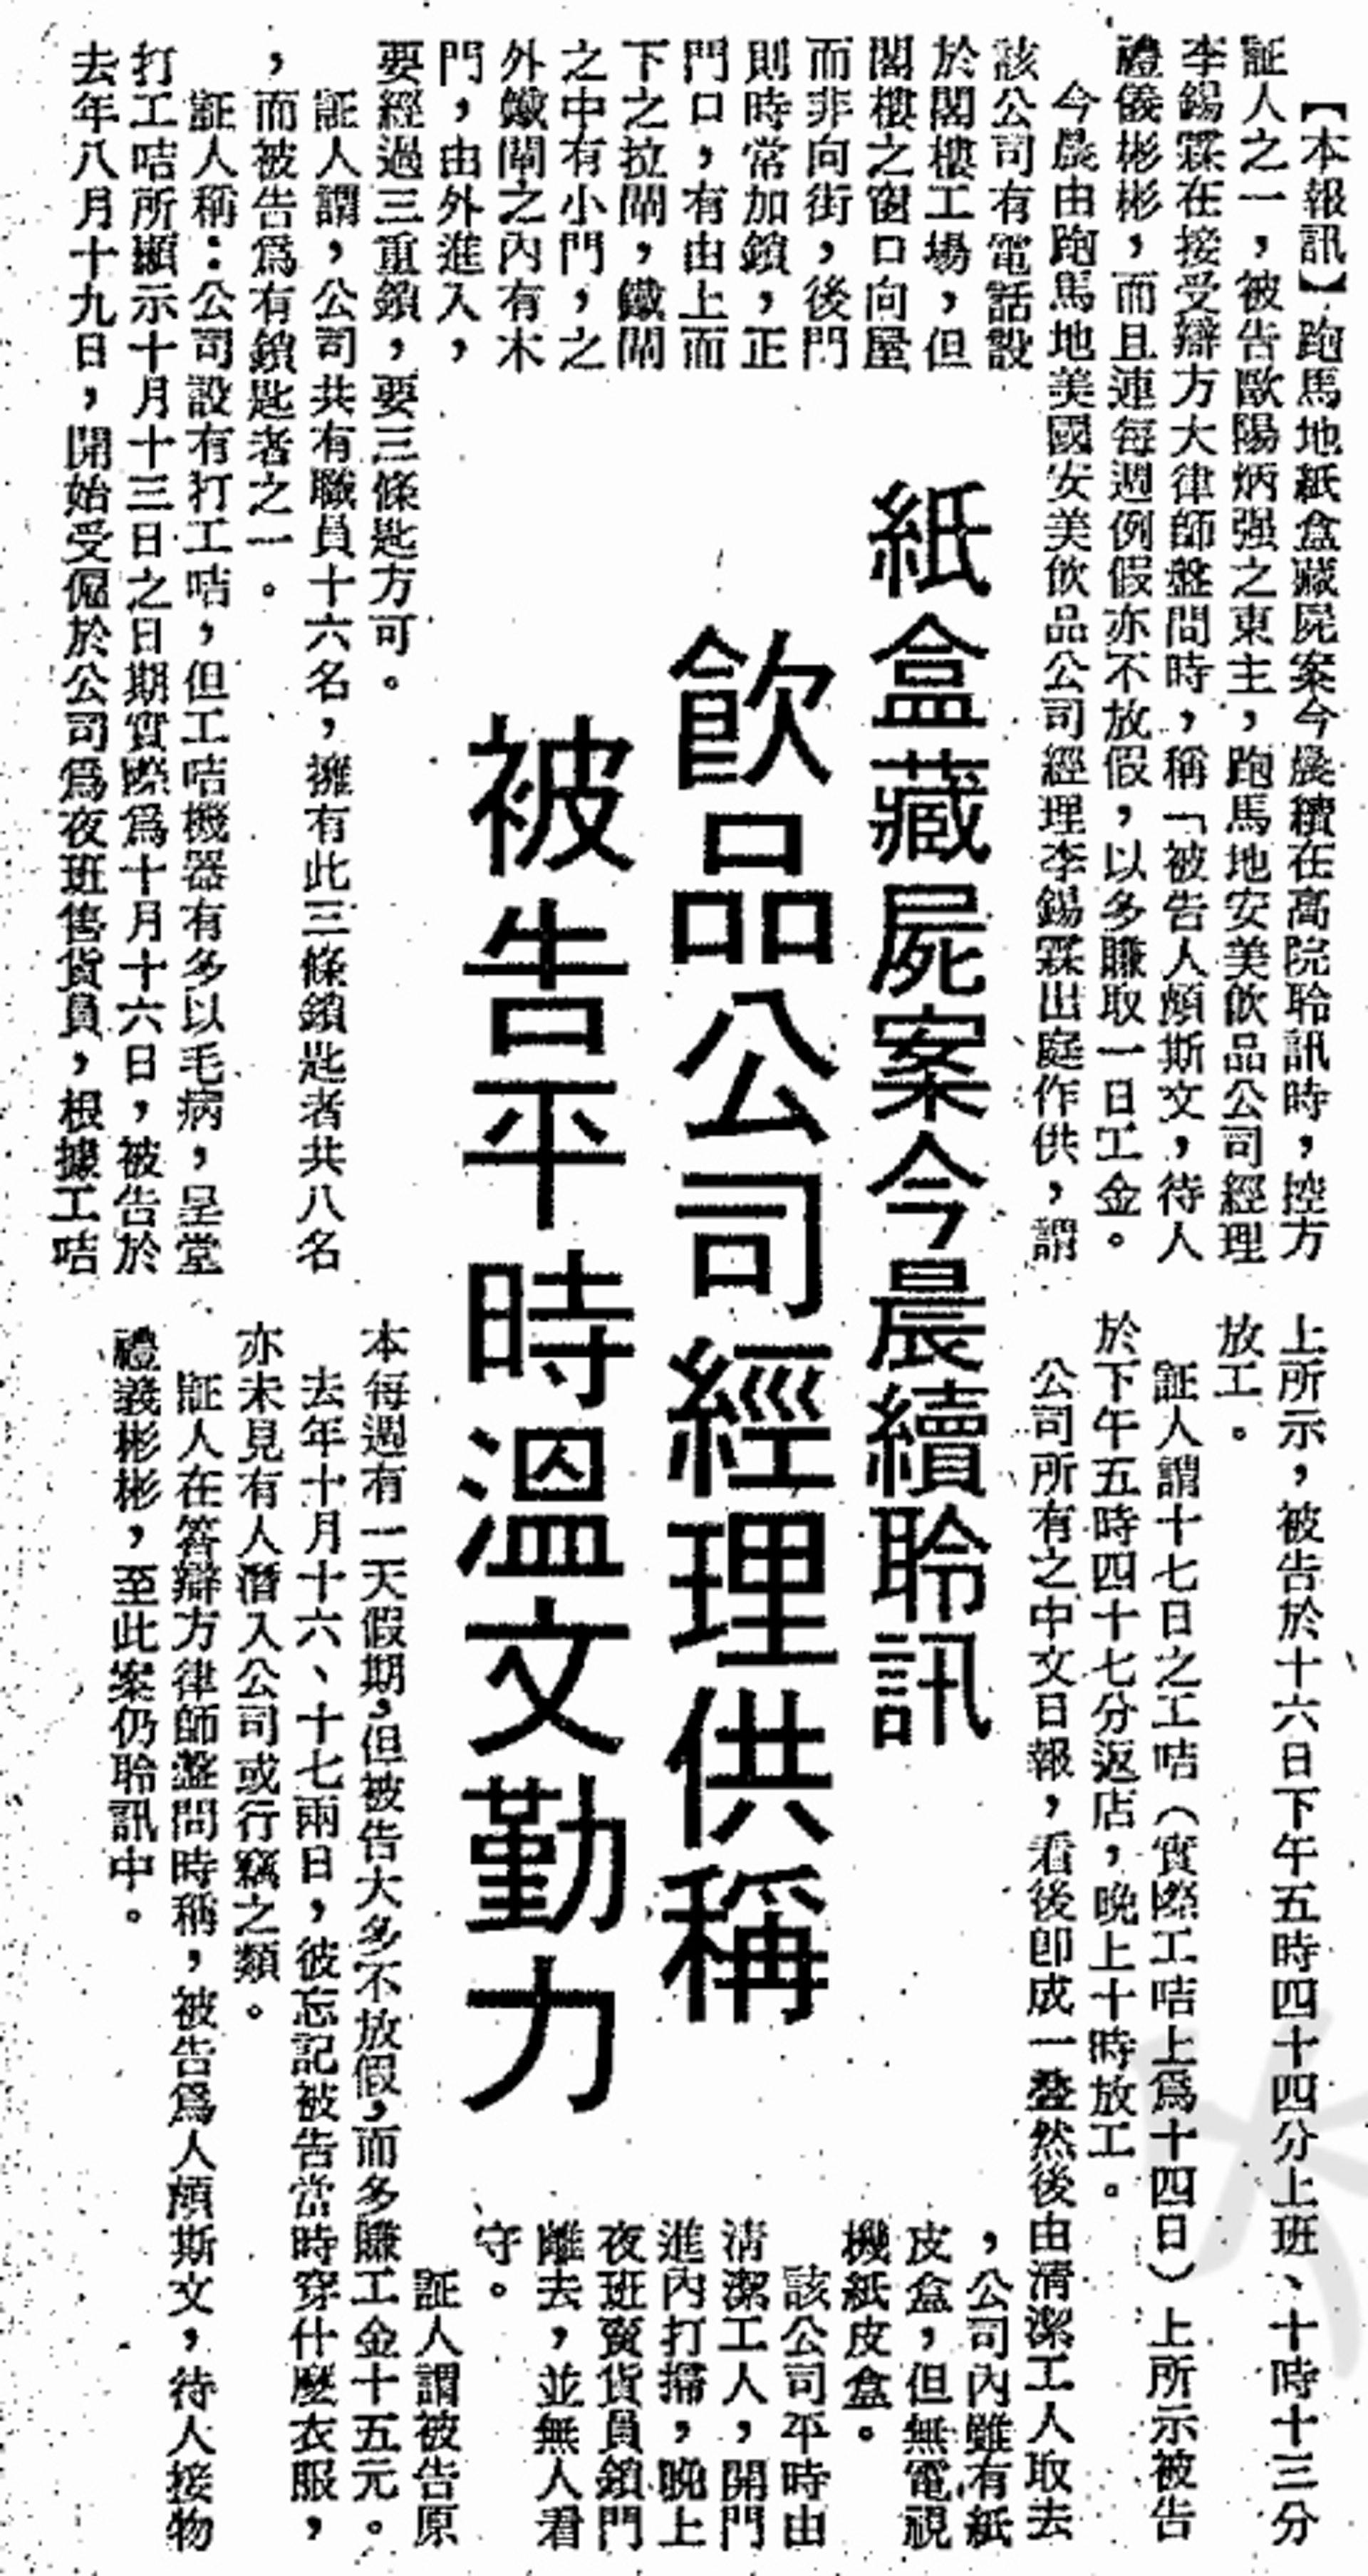 https://cdn.hk01.com/di/media/images/2232896/org/df49583acdbbedf810f6fb7483029a89.jpg/0a64_UjaCqLLs6gnsxPWZAHwws6ZKAbkYdrj8GHa4_A?v=w1920